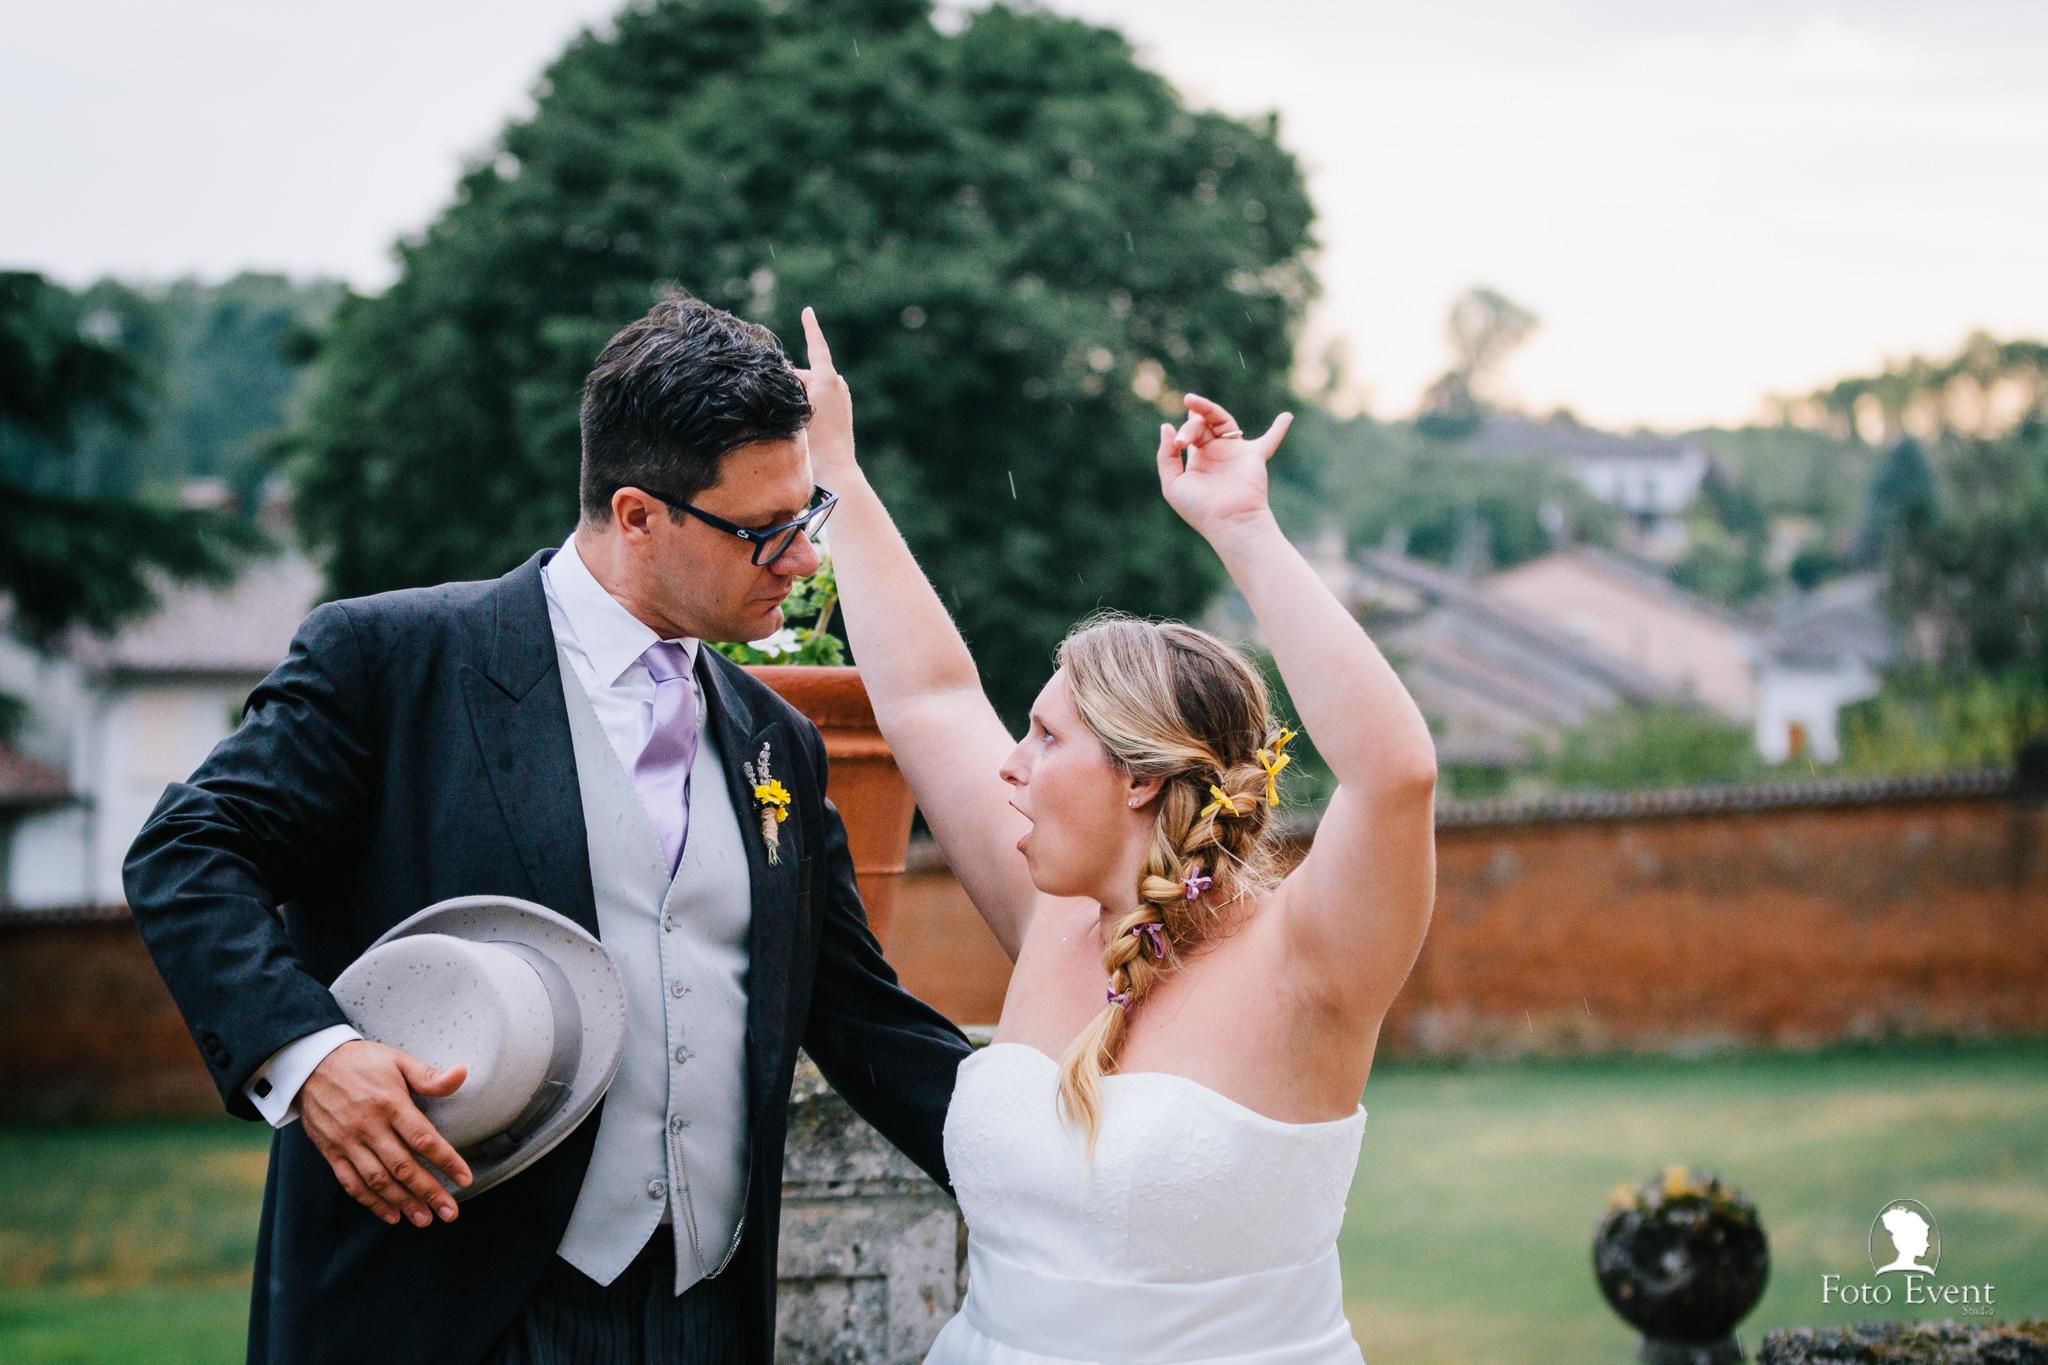 072-2019-07-27-Matrimonio-Valentina-e-Alessandro-Pettinari-zoom-616